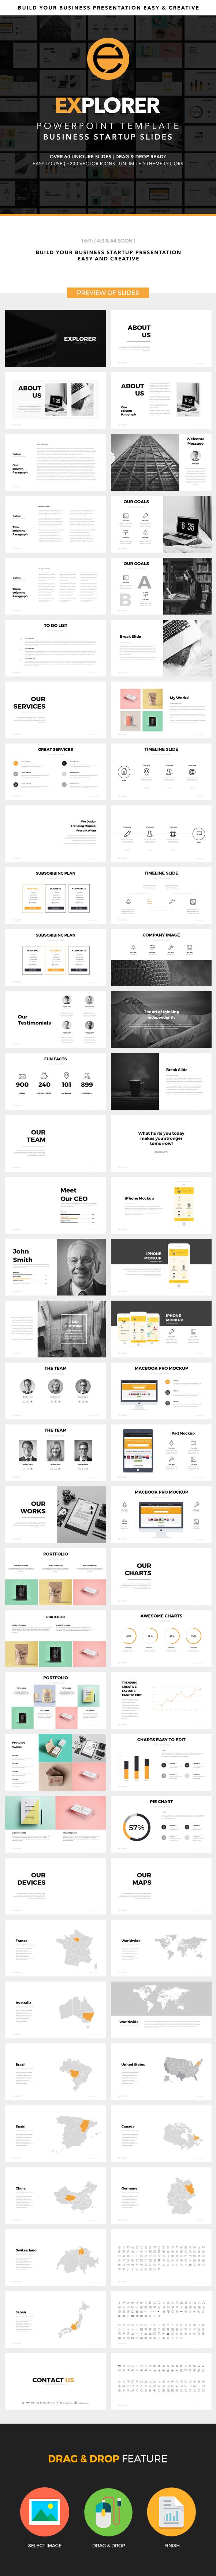 Explorer Powerpoint Template - Business PowerPoint Templates